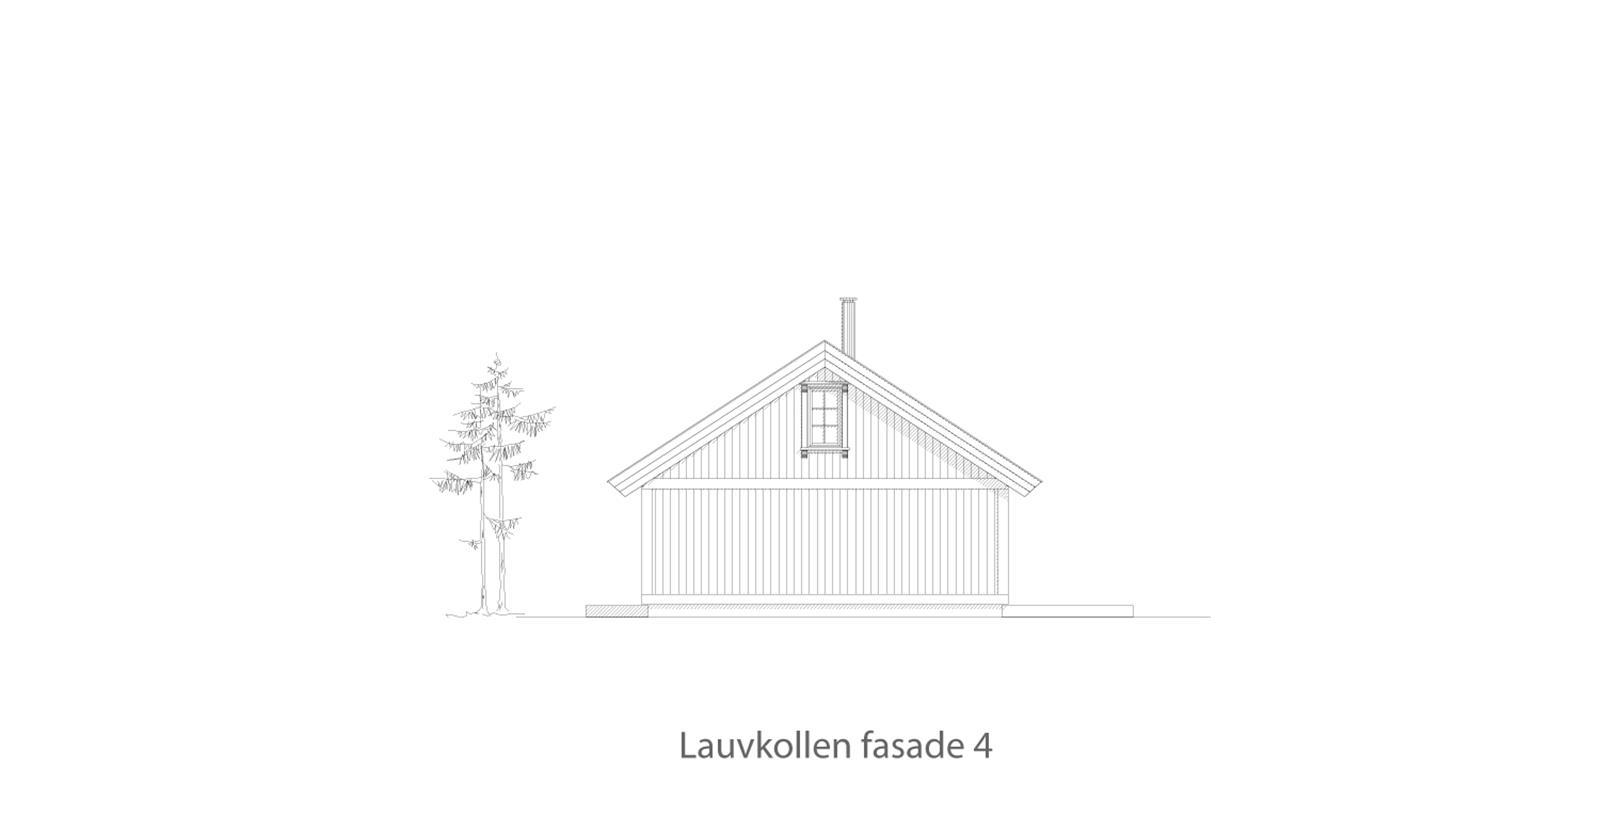 Lauvkollen fasade 4